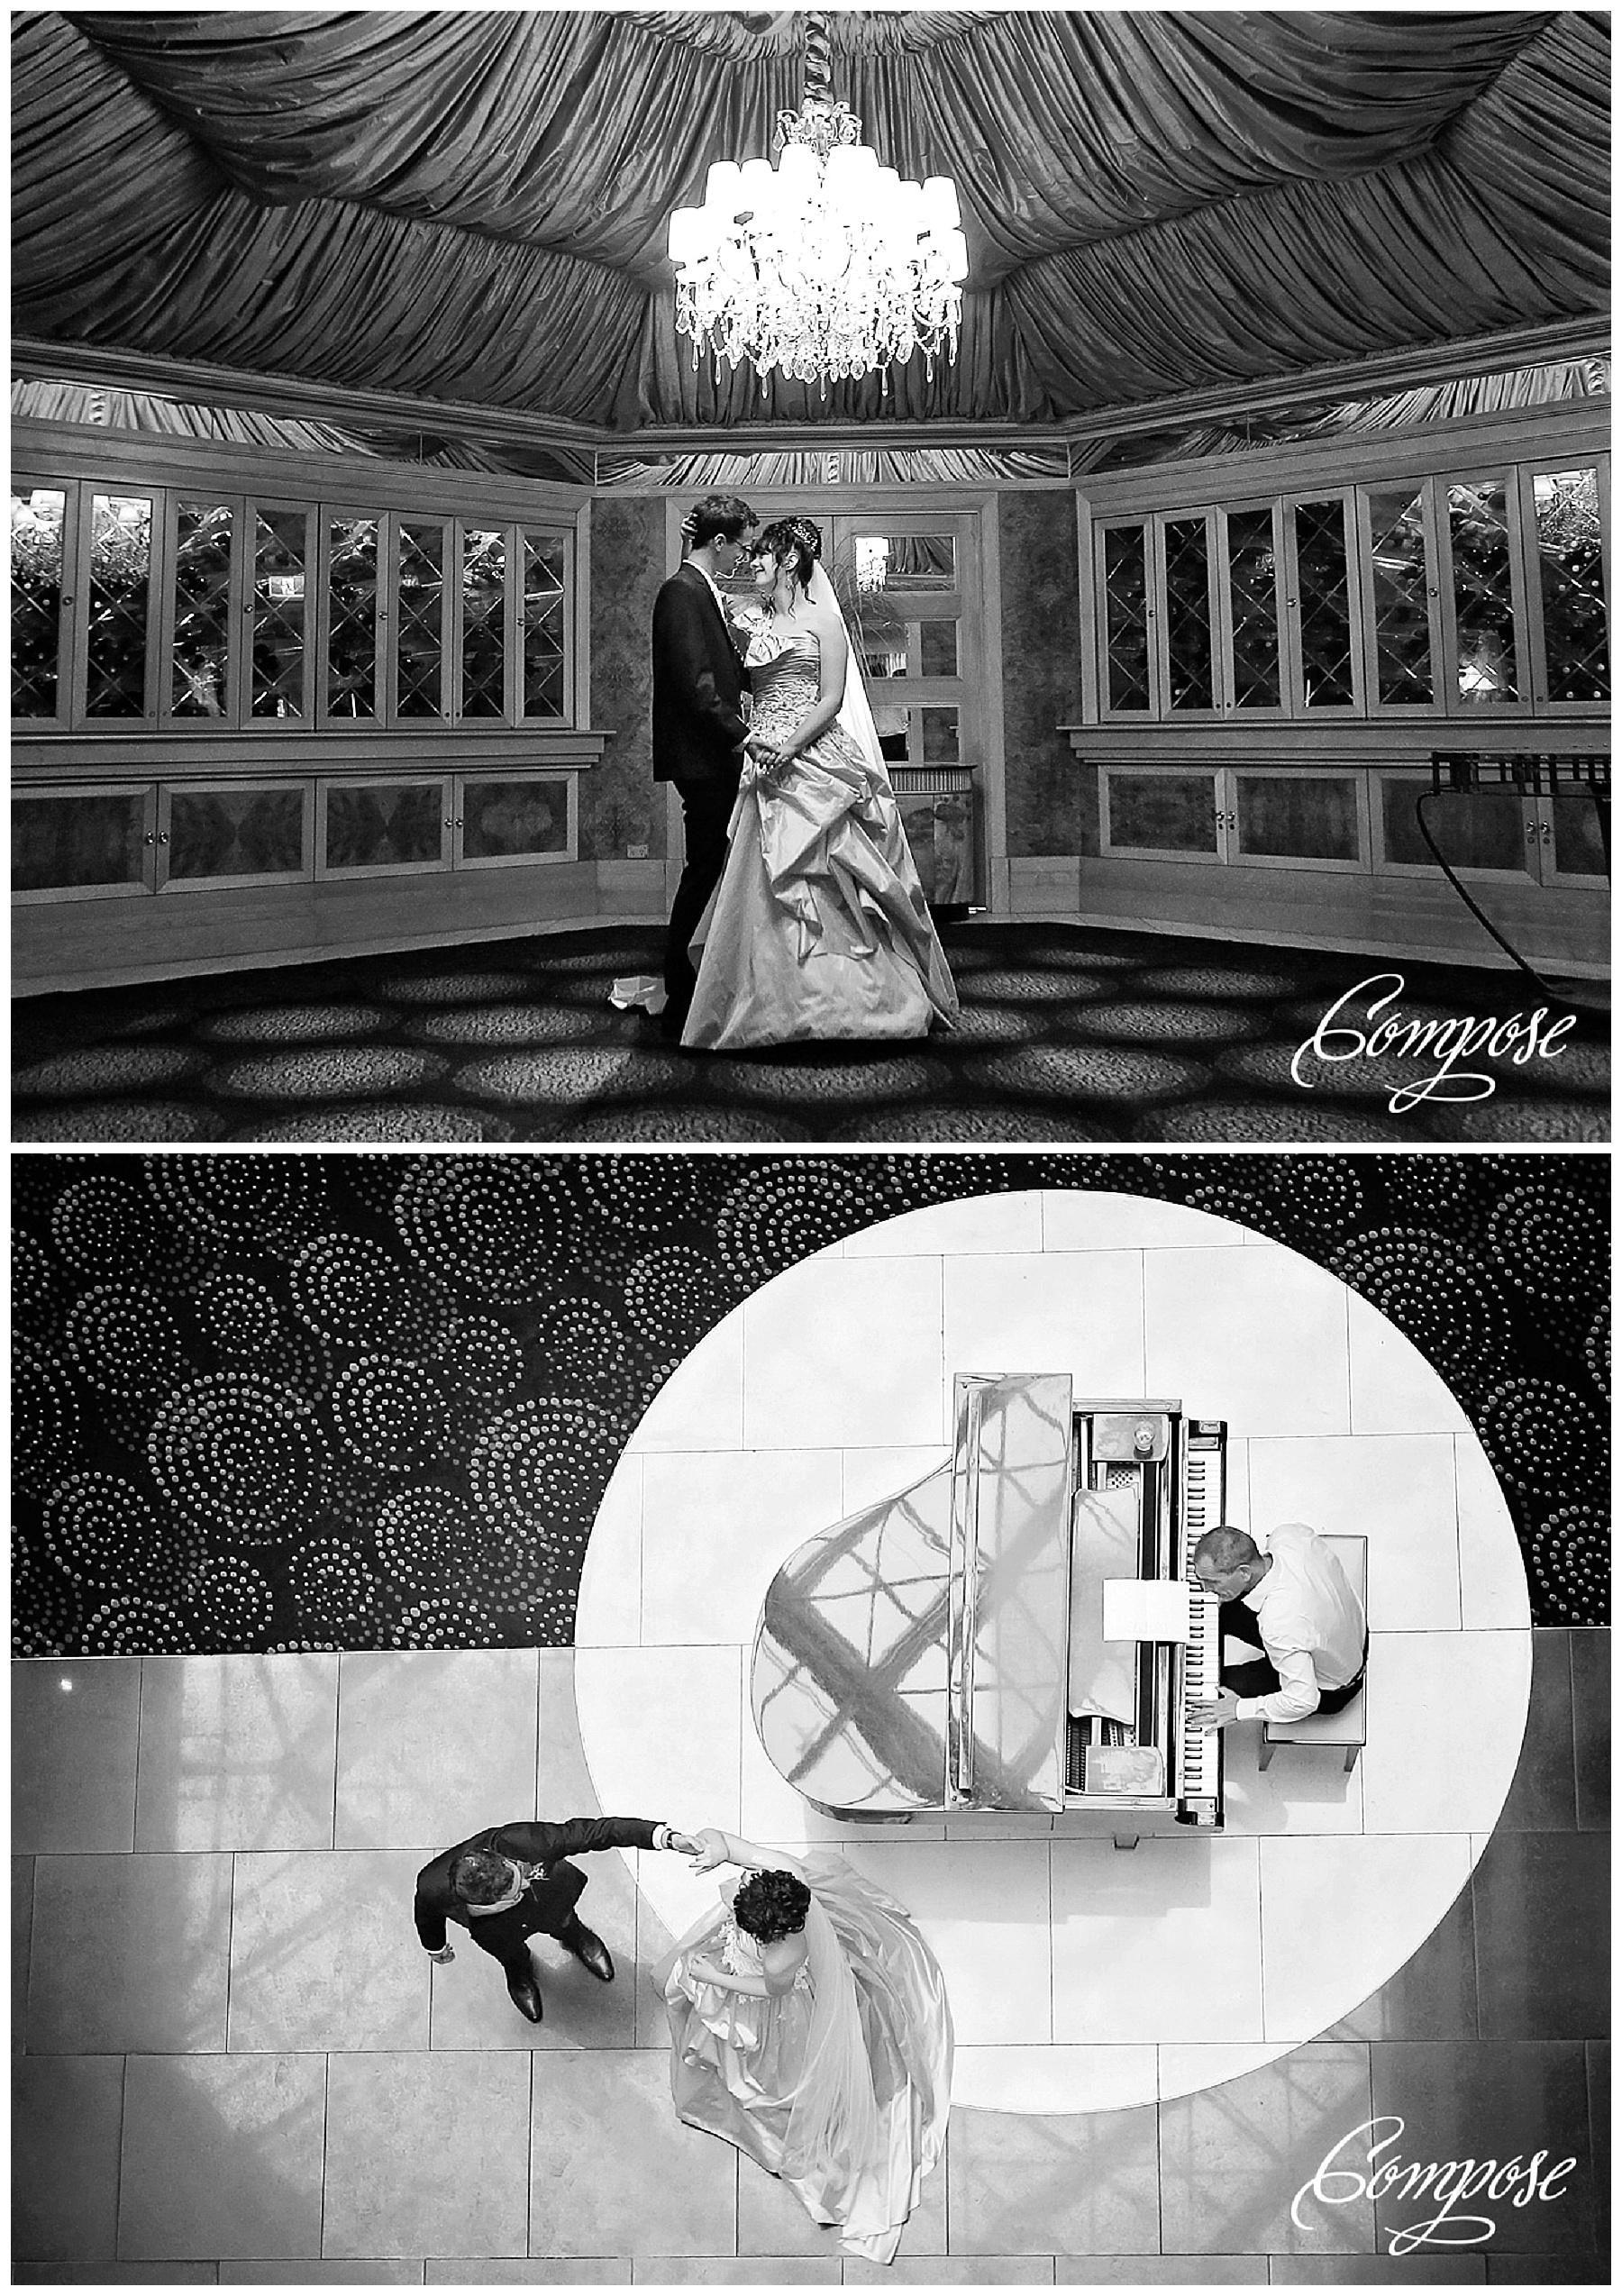 Gershwin's wedding